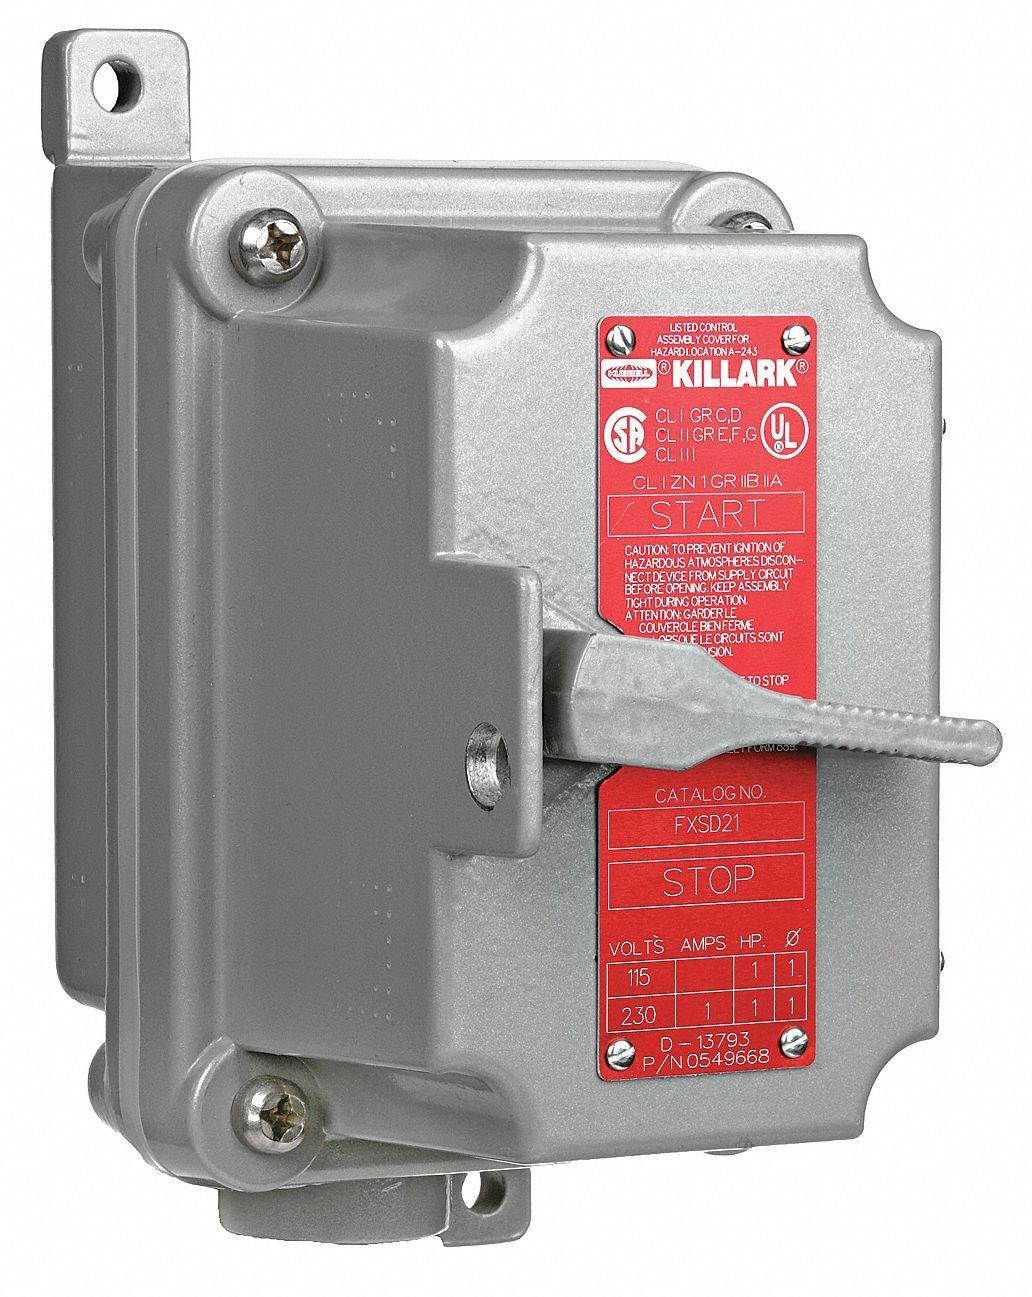 Hubbell KILLARK 1-Pole 20 Amp Toggle Tumbler Switch, 1/2